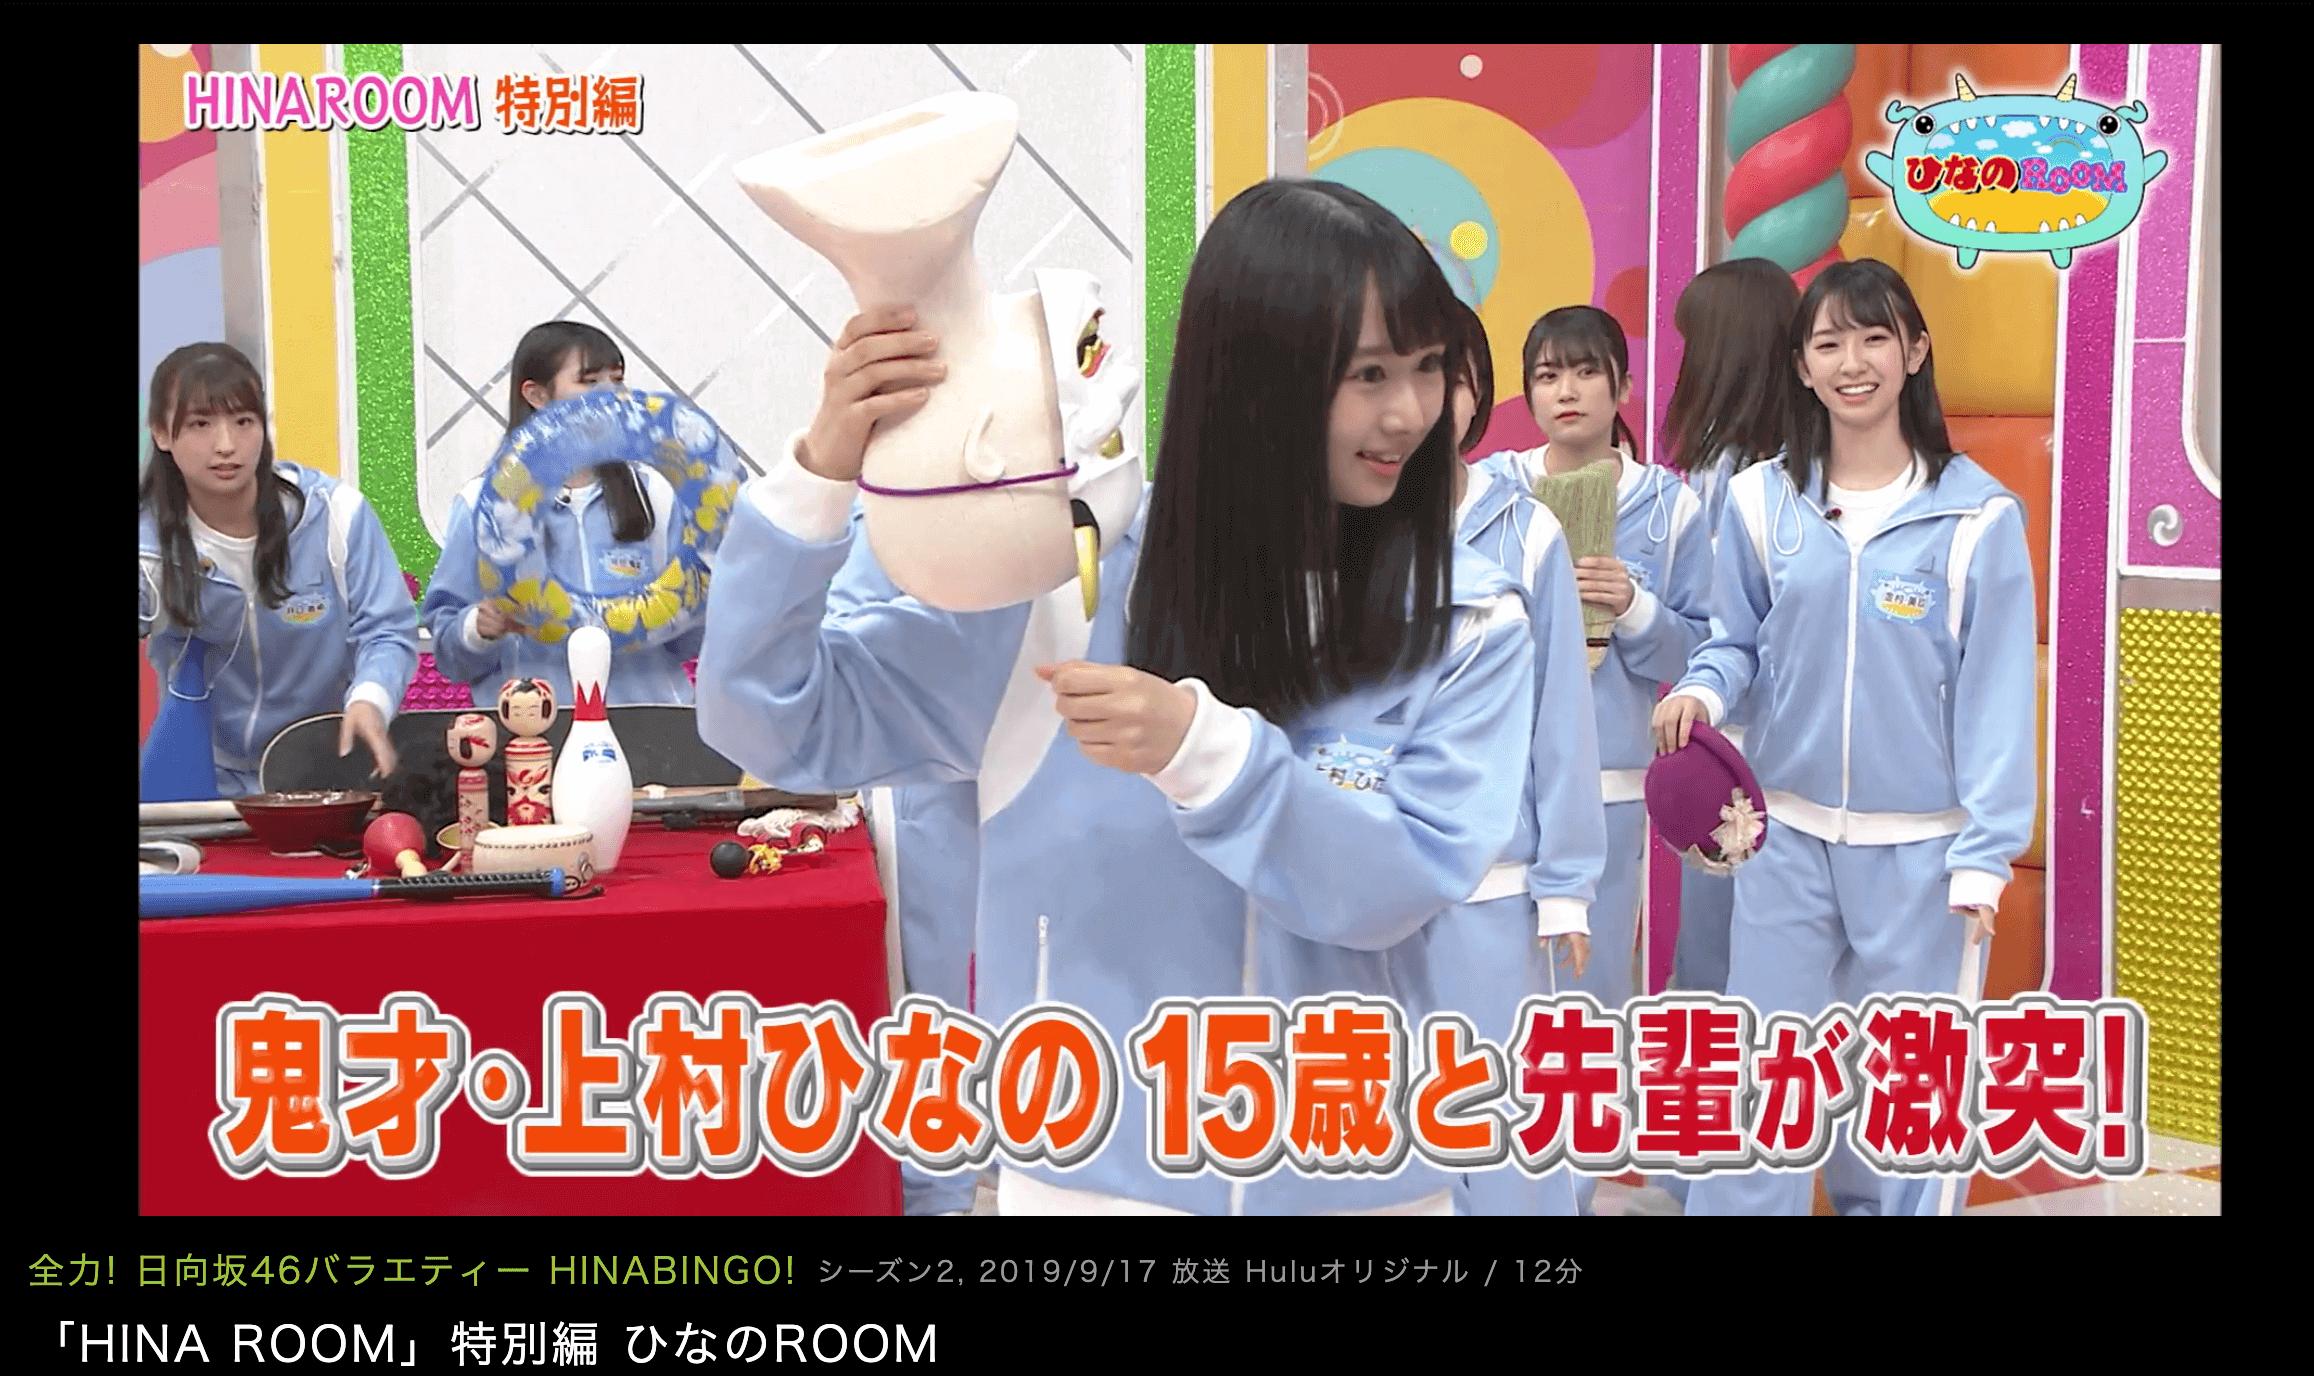 hinabingo2第10話のhinaroom画像